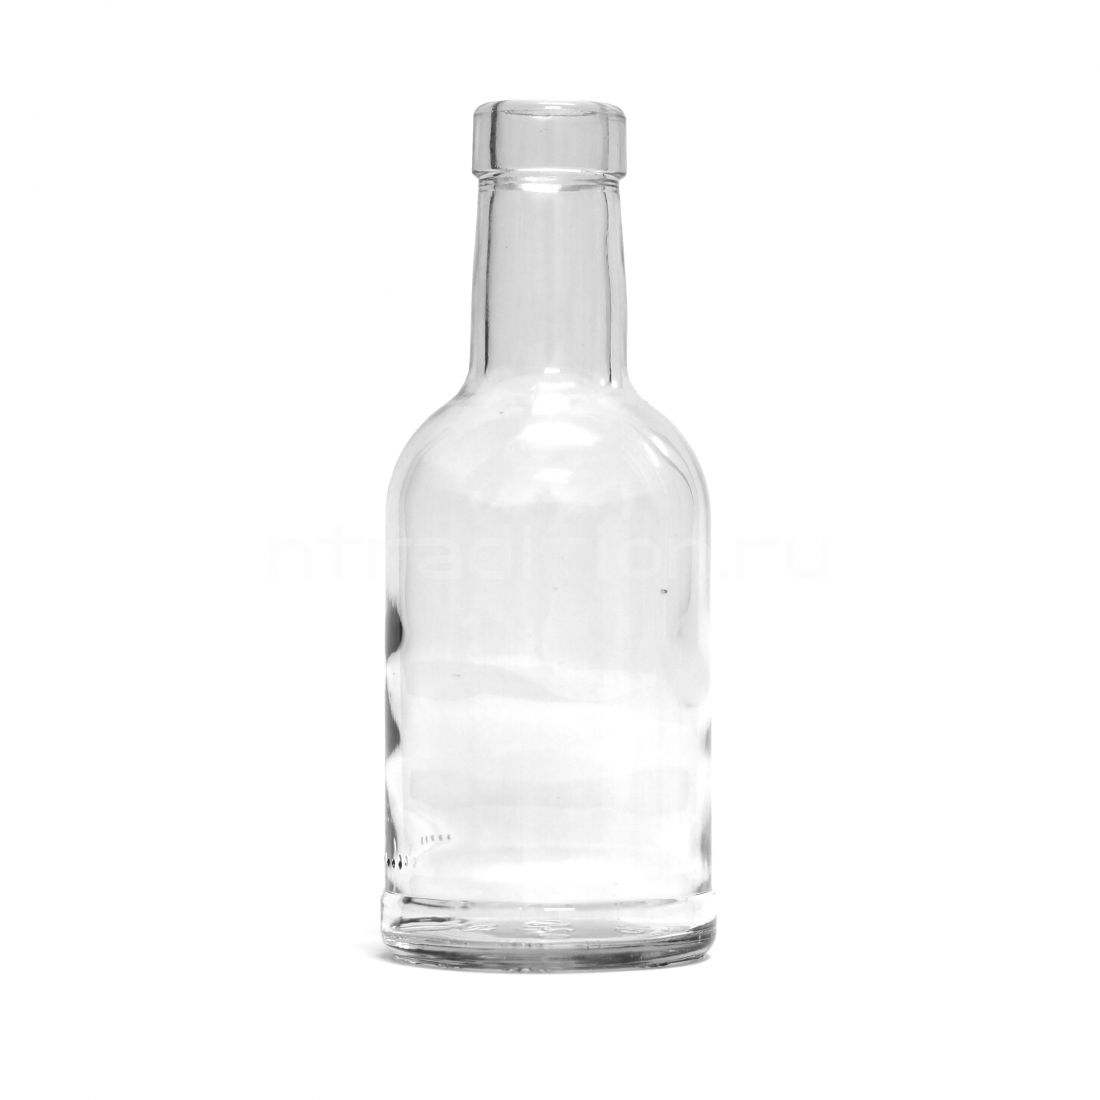 Бутылка Домашний Самогон, 0,2 л / 20 шт.